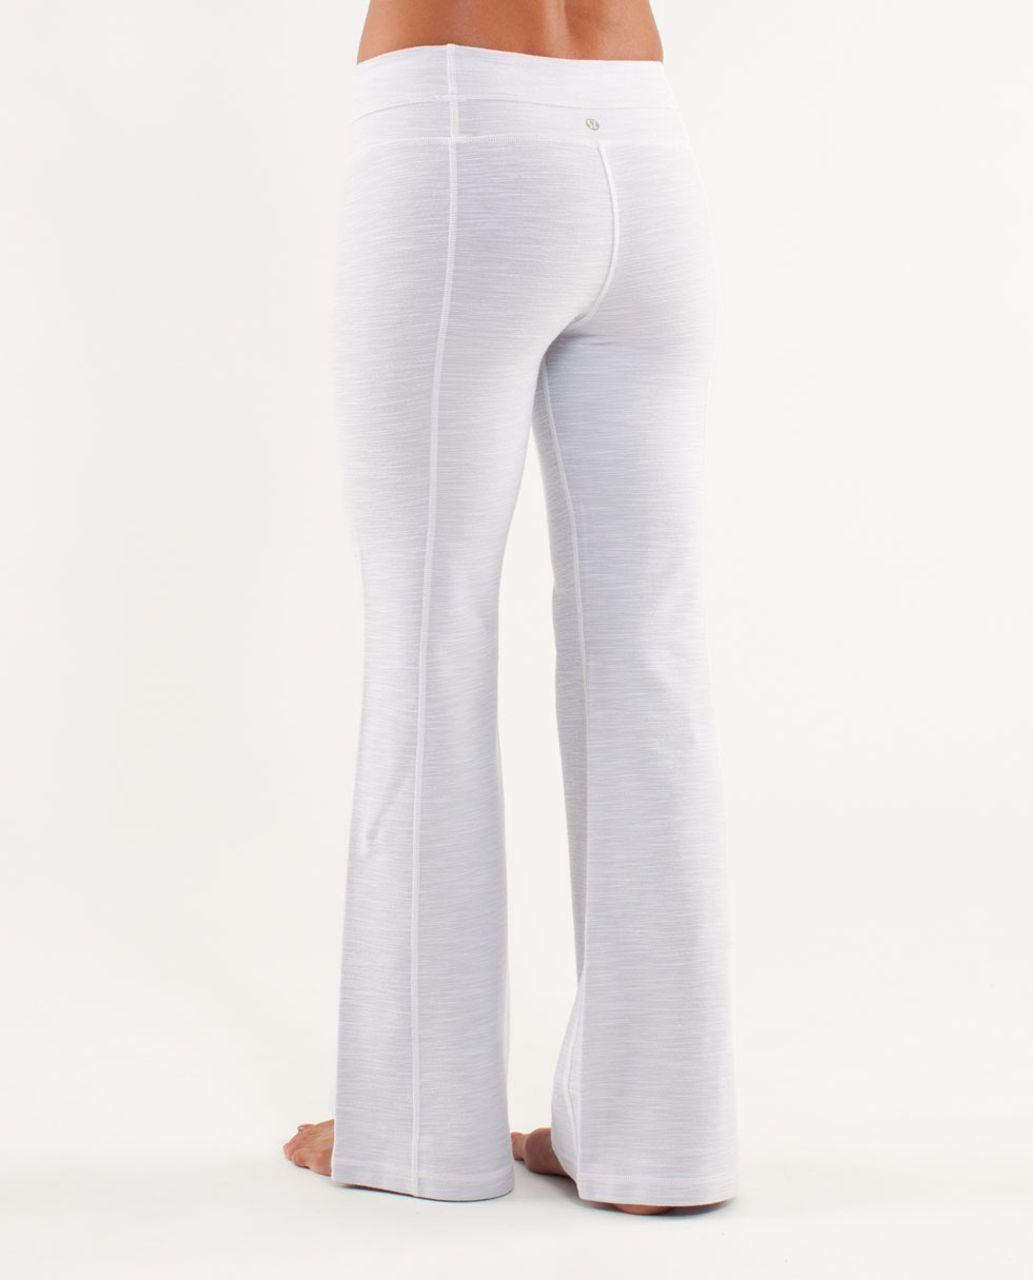 Lululemon Groove Pant *Denim (Regular) - White Slub Denim